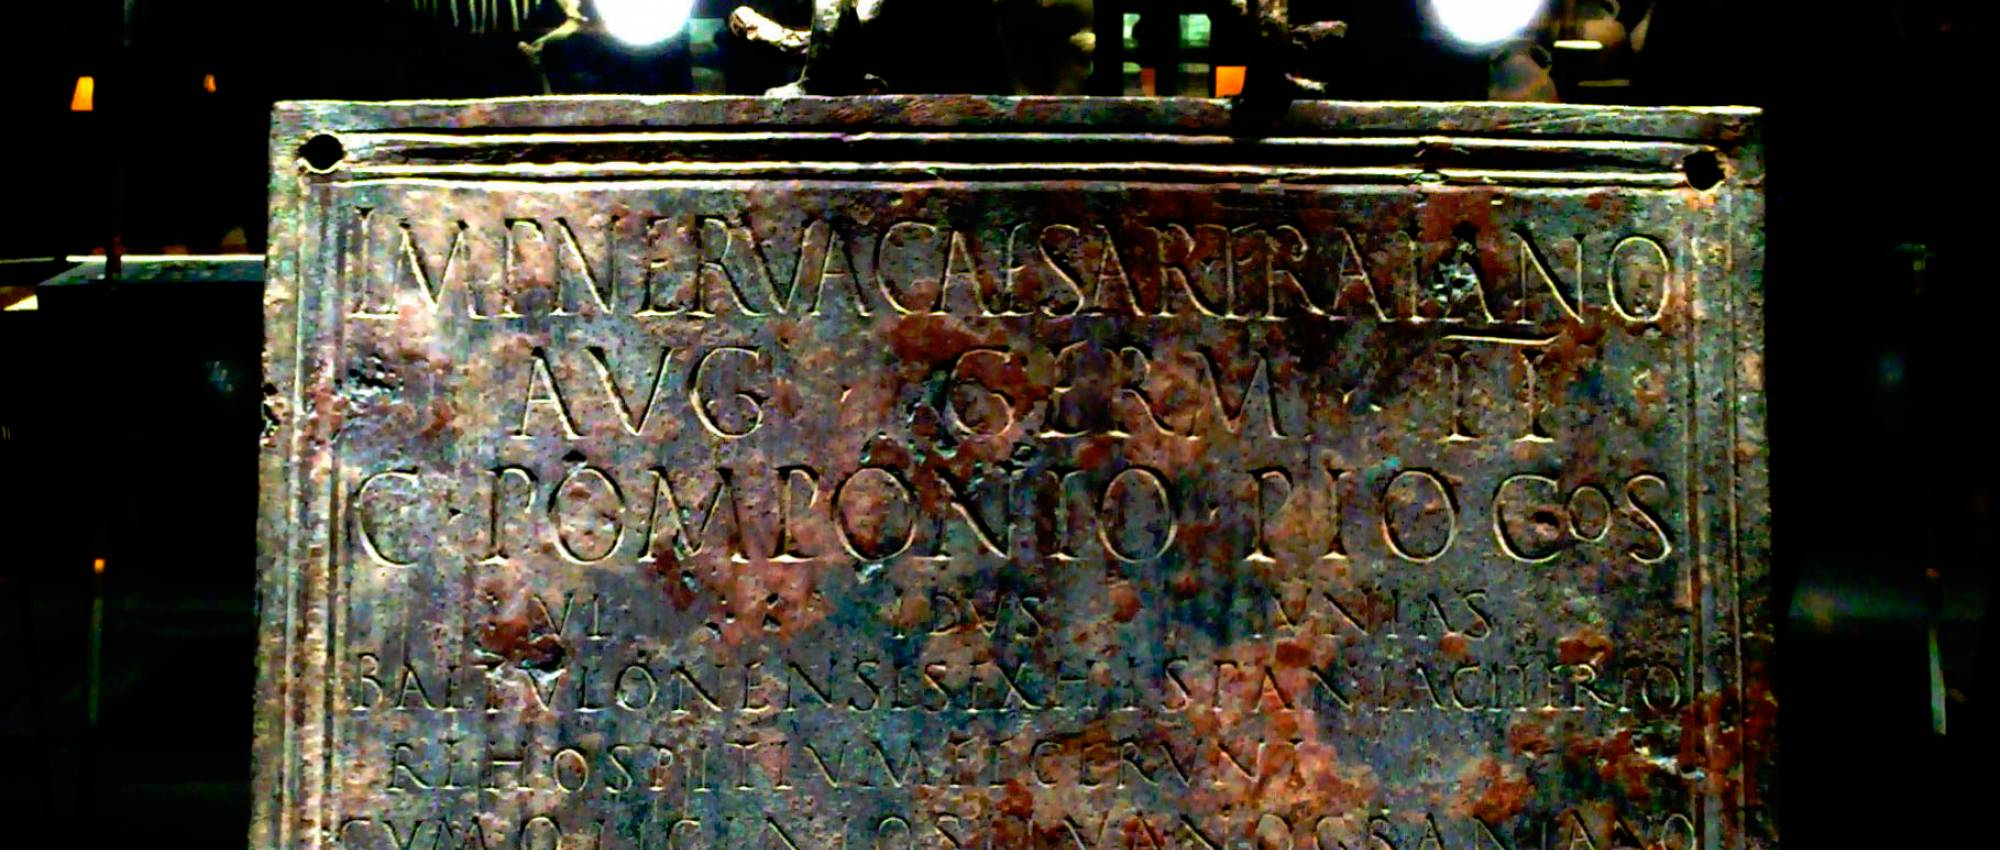 Fragment de la Tabula Hospitalis. Xavier Estruch / Wikimedia Commons. CC BY-SA 2.0